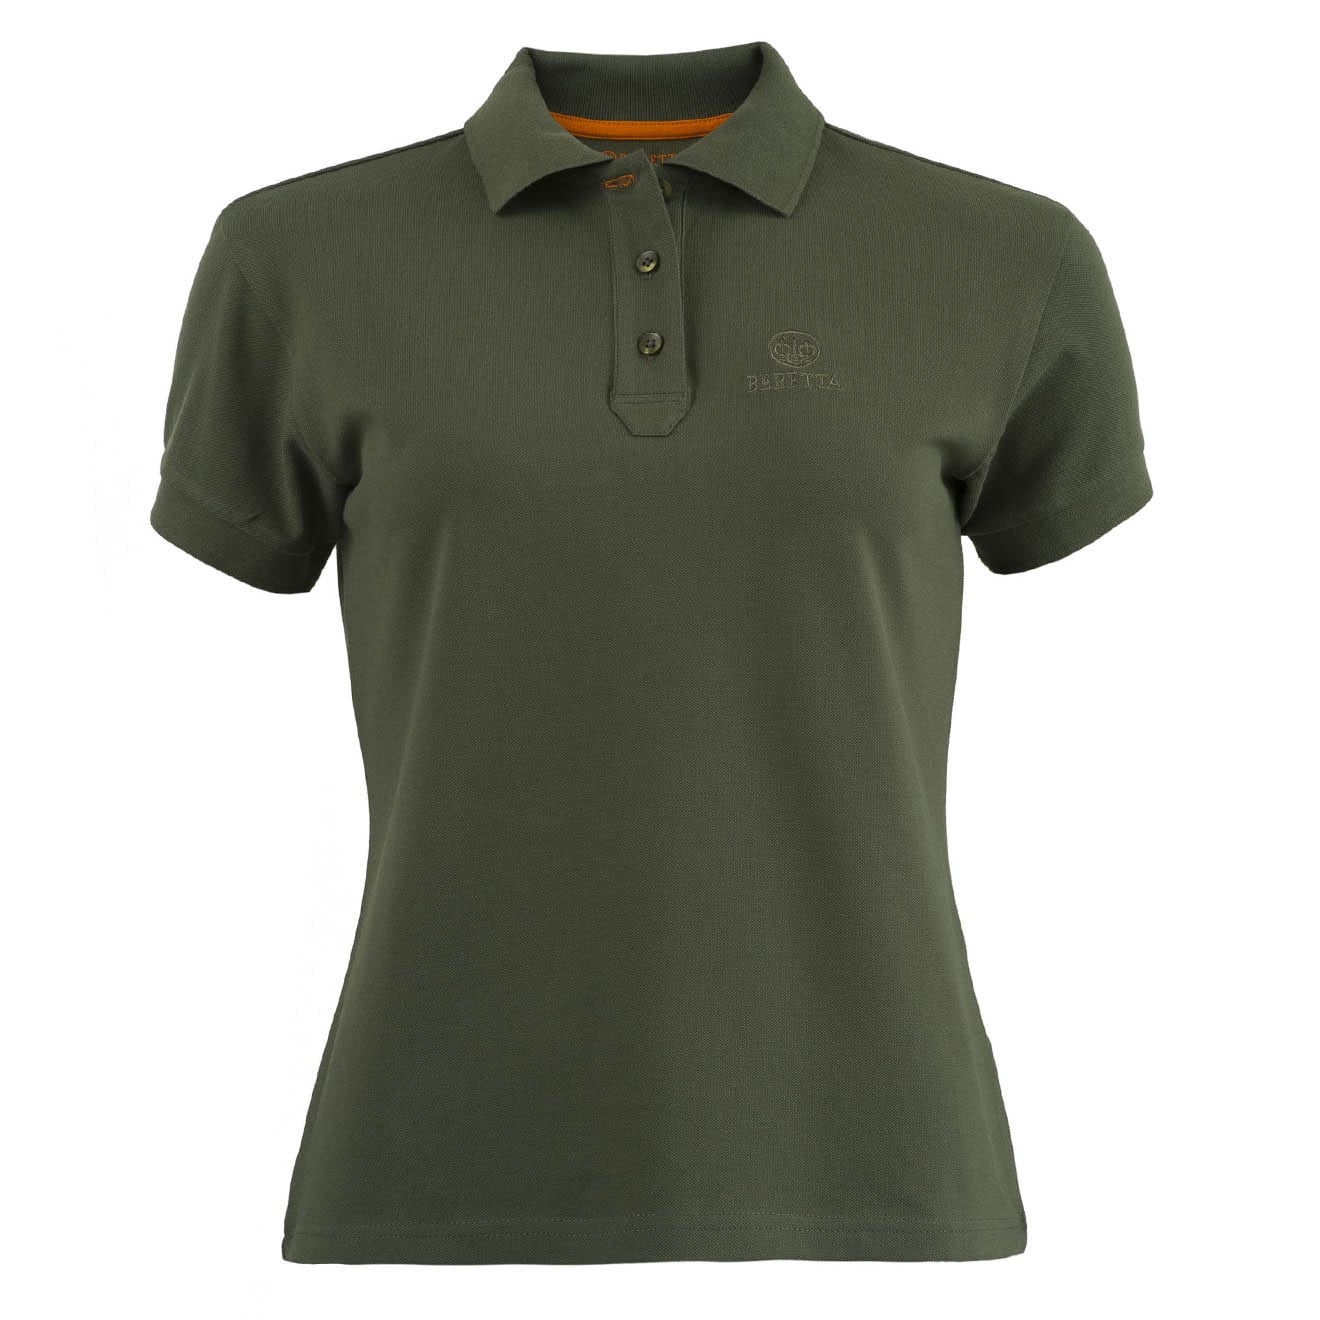 Beretta Corporate Polo Shirt Green Leaf